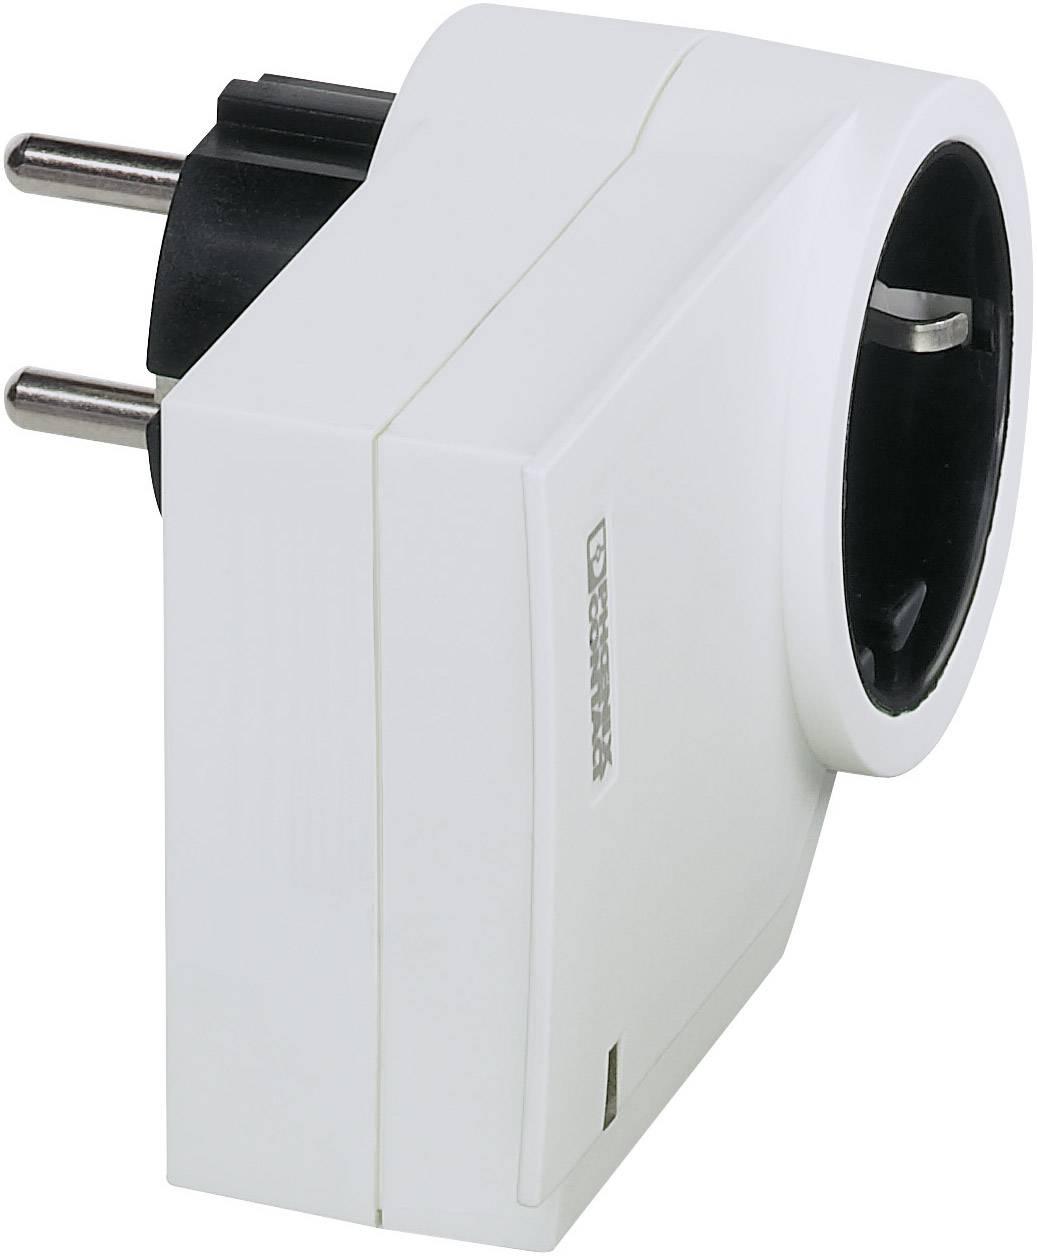 Medzizásuvka s prepäťovou ochranou Phoenix Contact MNT-1D/WH 2882213, 3 kA, biela